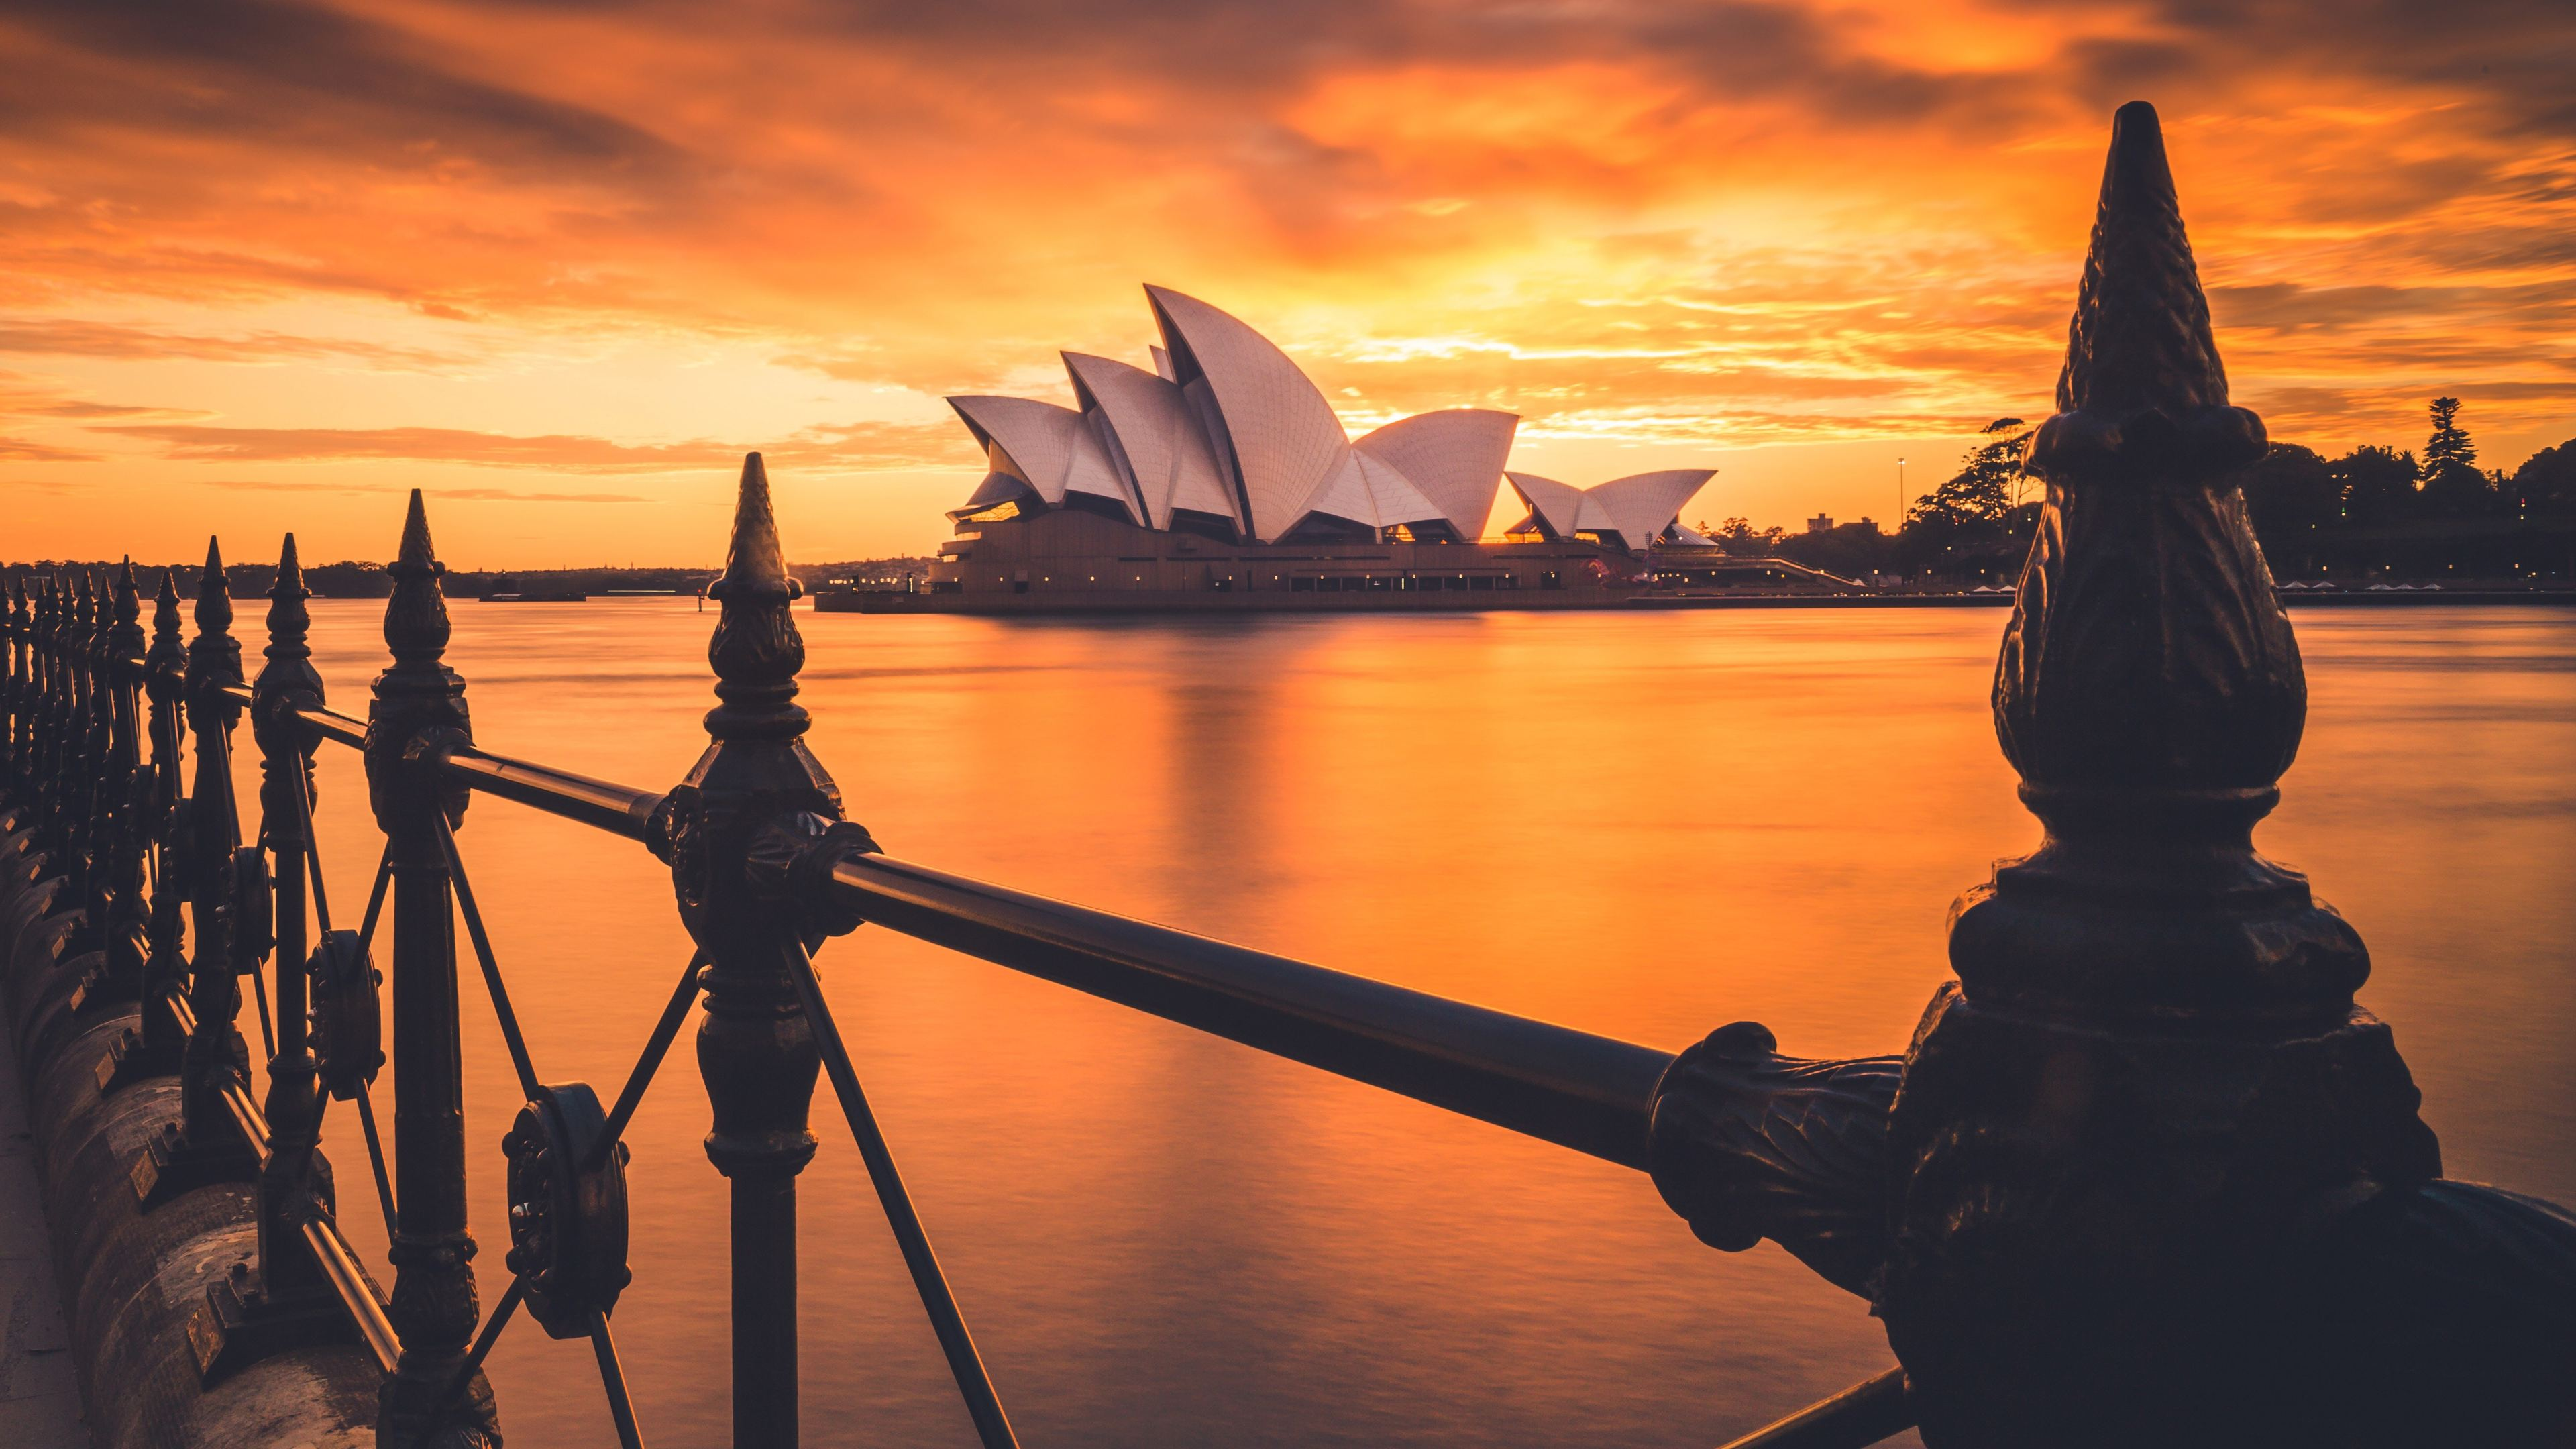 sydney opera house 4k 1538069320 - Sydney Opera House 4k - world wallpapers, sydney wallpapers, sydney opera house wallpapers, hd-wallpapers, australia wallpapers, 4k-wallpapers